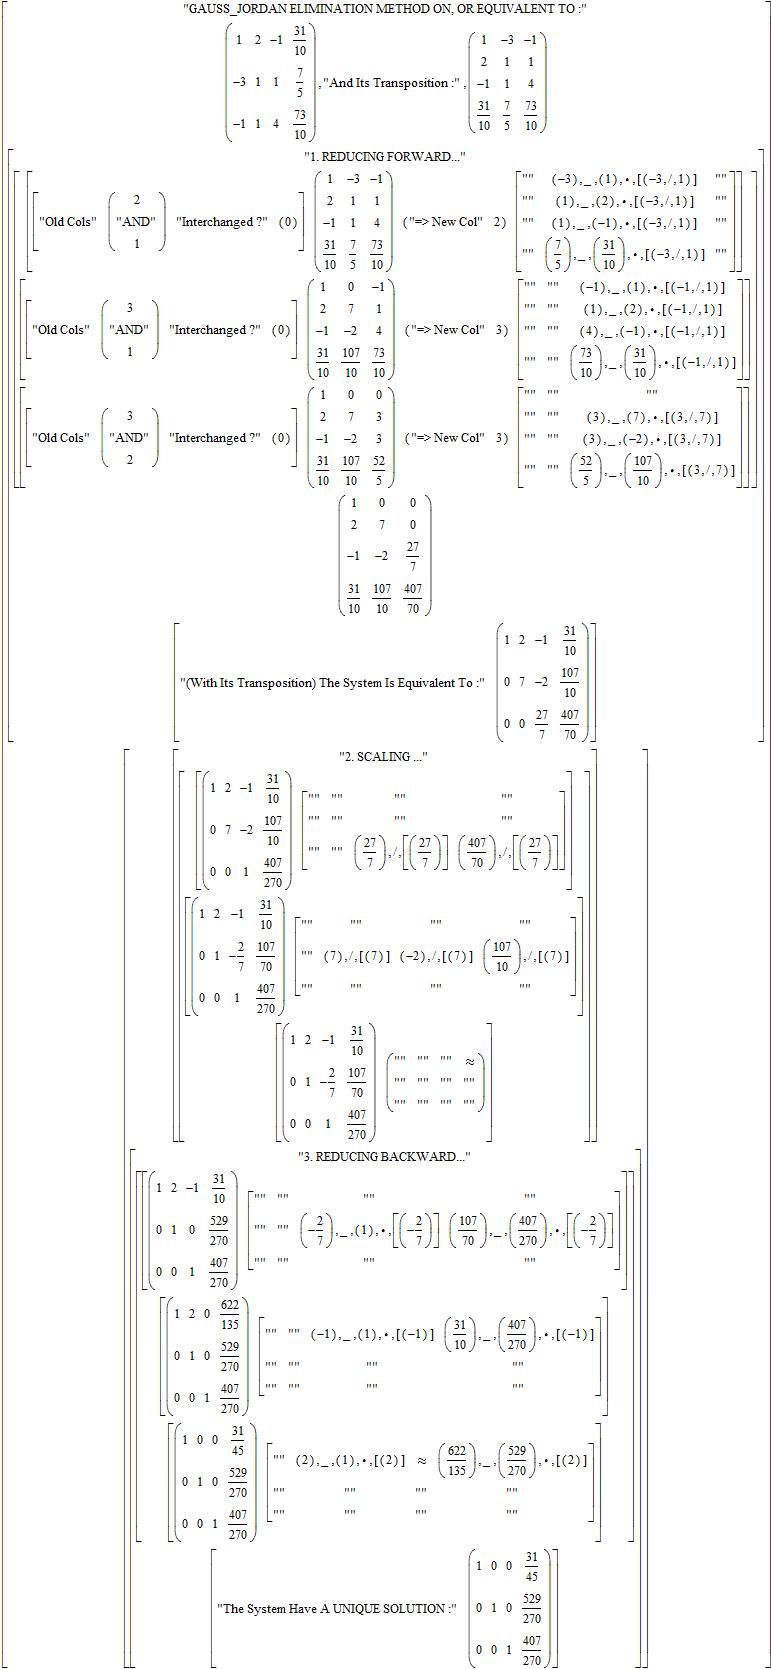 LU Decomposition Method, Really Need Help ASAP - PTC Community